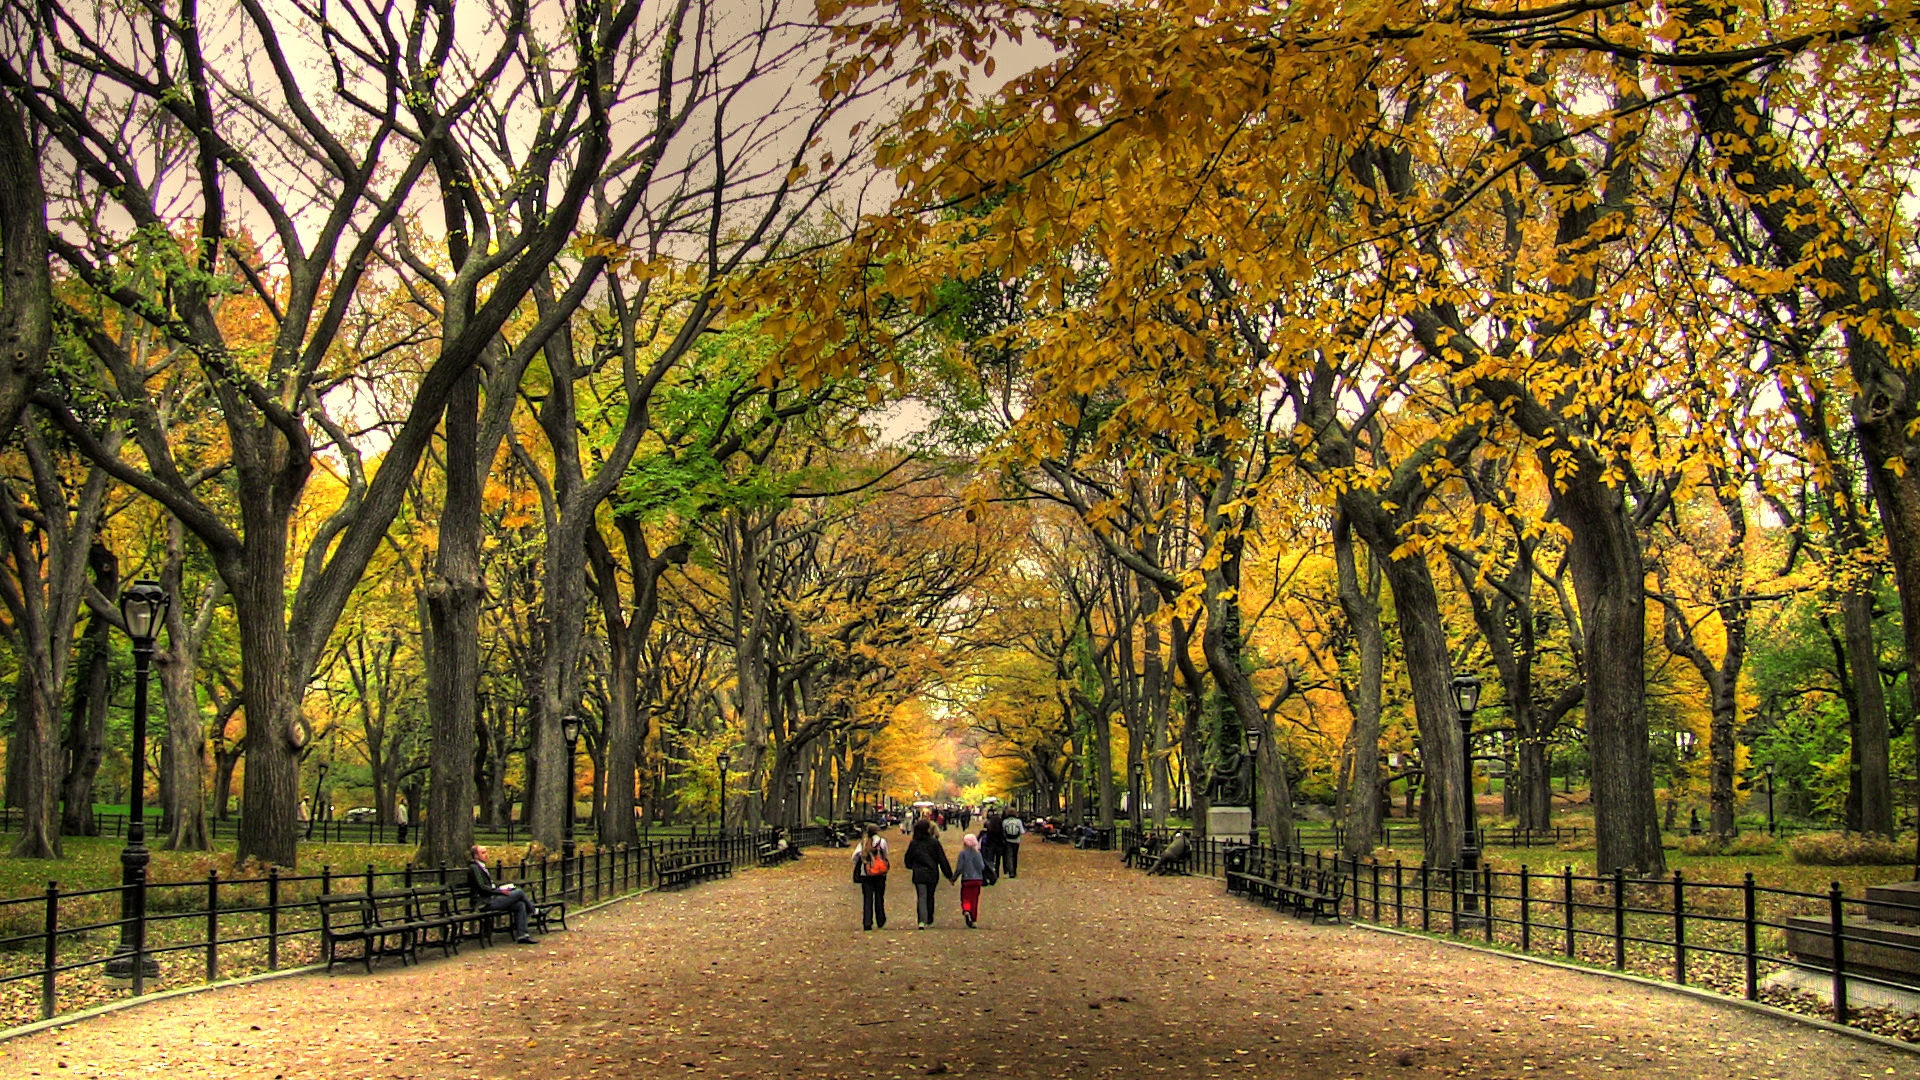 autumn background playlist park central fall1 1920x1080